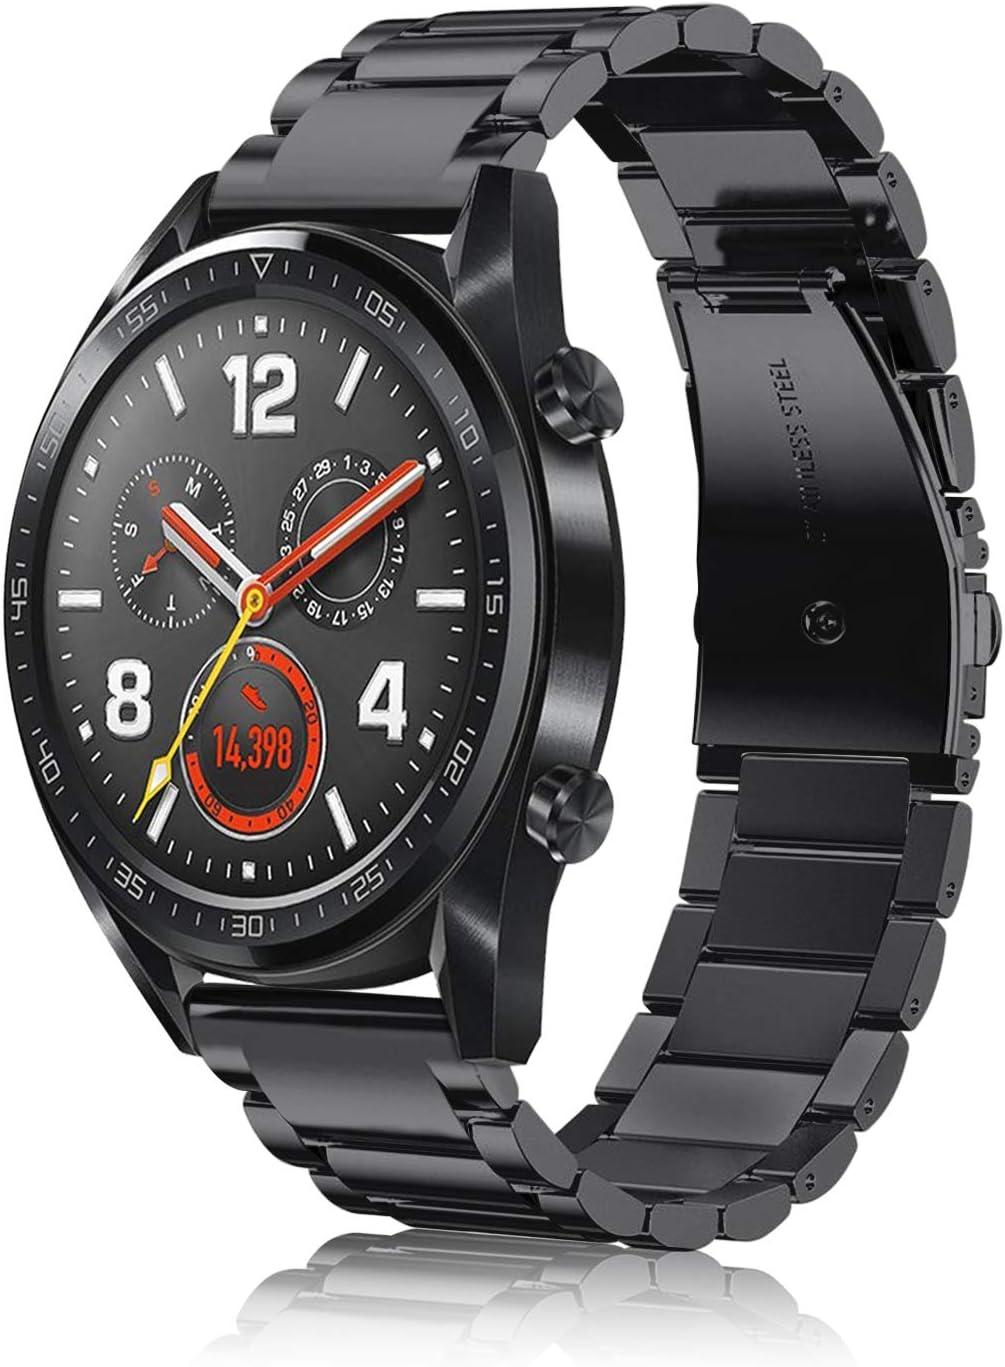 Fintie Correa Compatible con Huawei Watch GT 2 / Huawei Watch GT 46mm Sport/Classic/Active/Elite - Pulsera de Repuesto de Acero Inoxidable Banda Ajustable de Metal, Negro